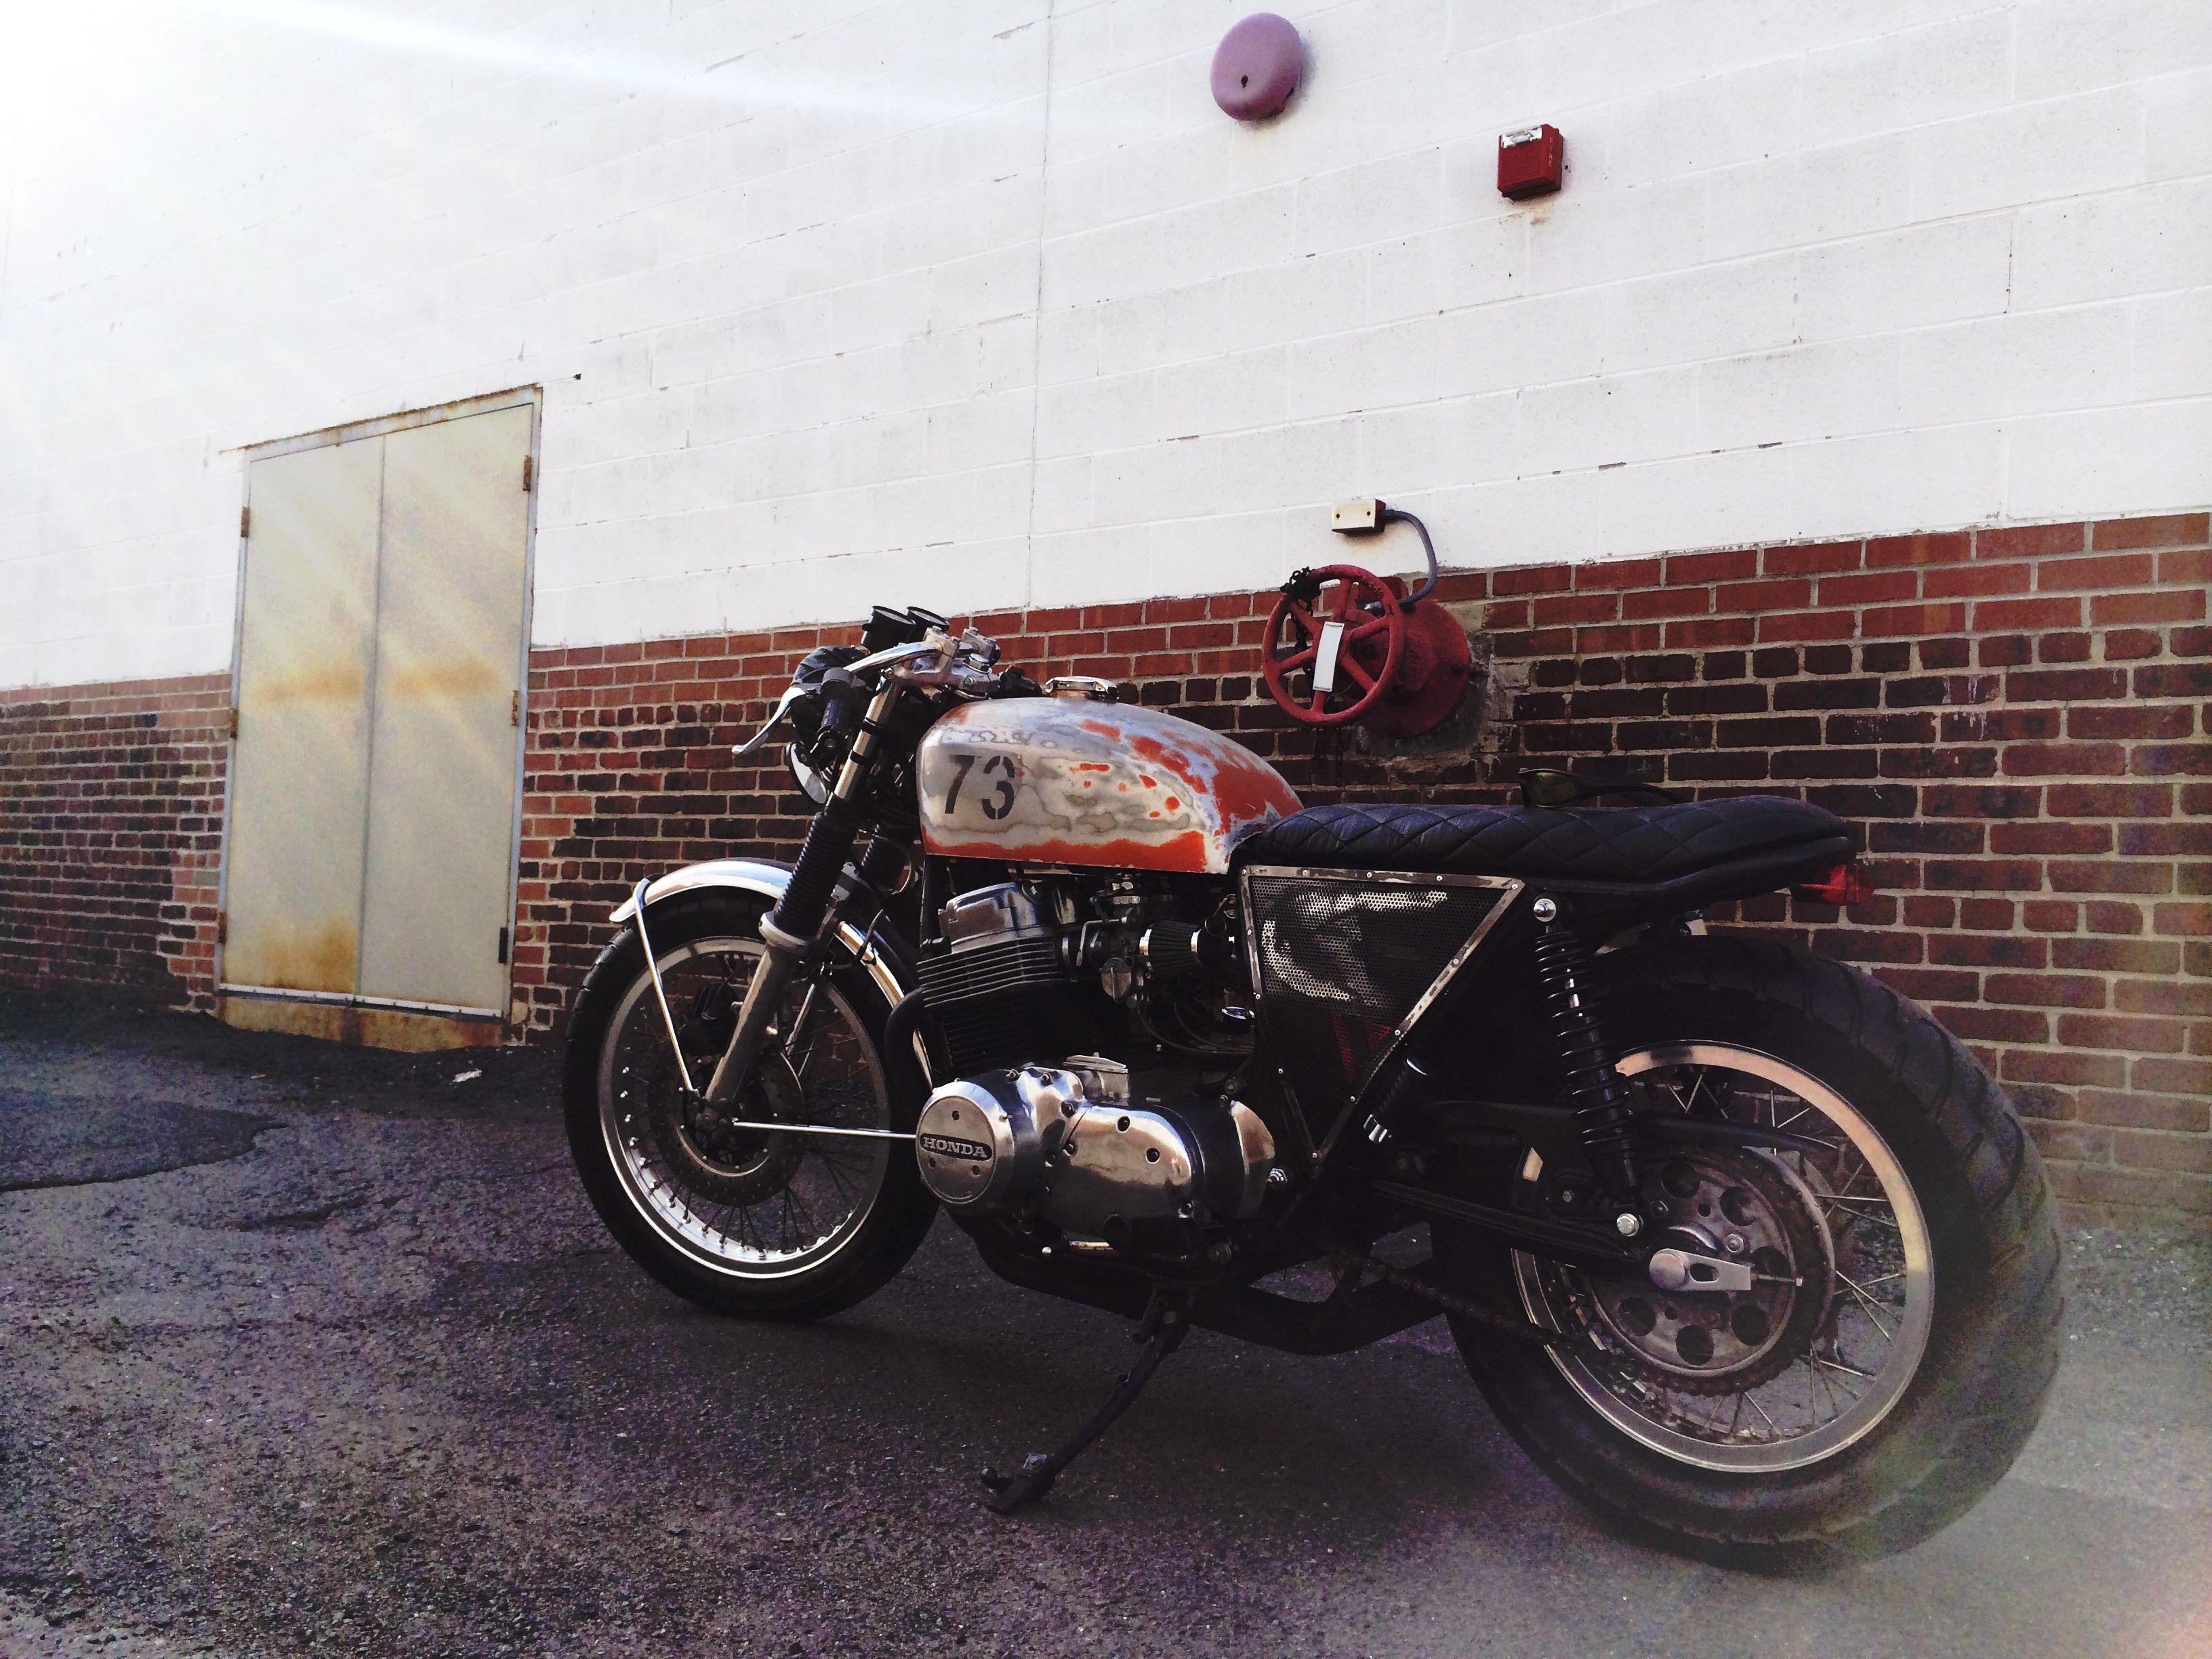 73 Cb750 Cafe Racer Brat